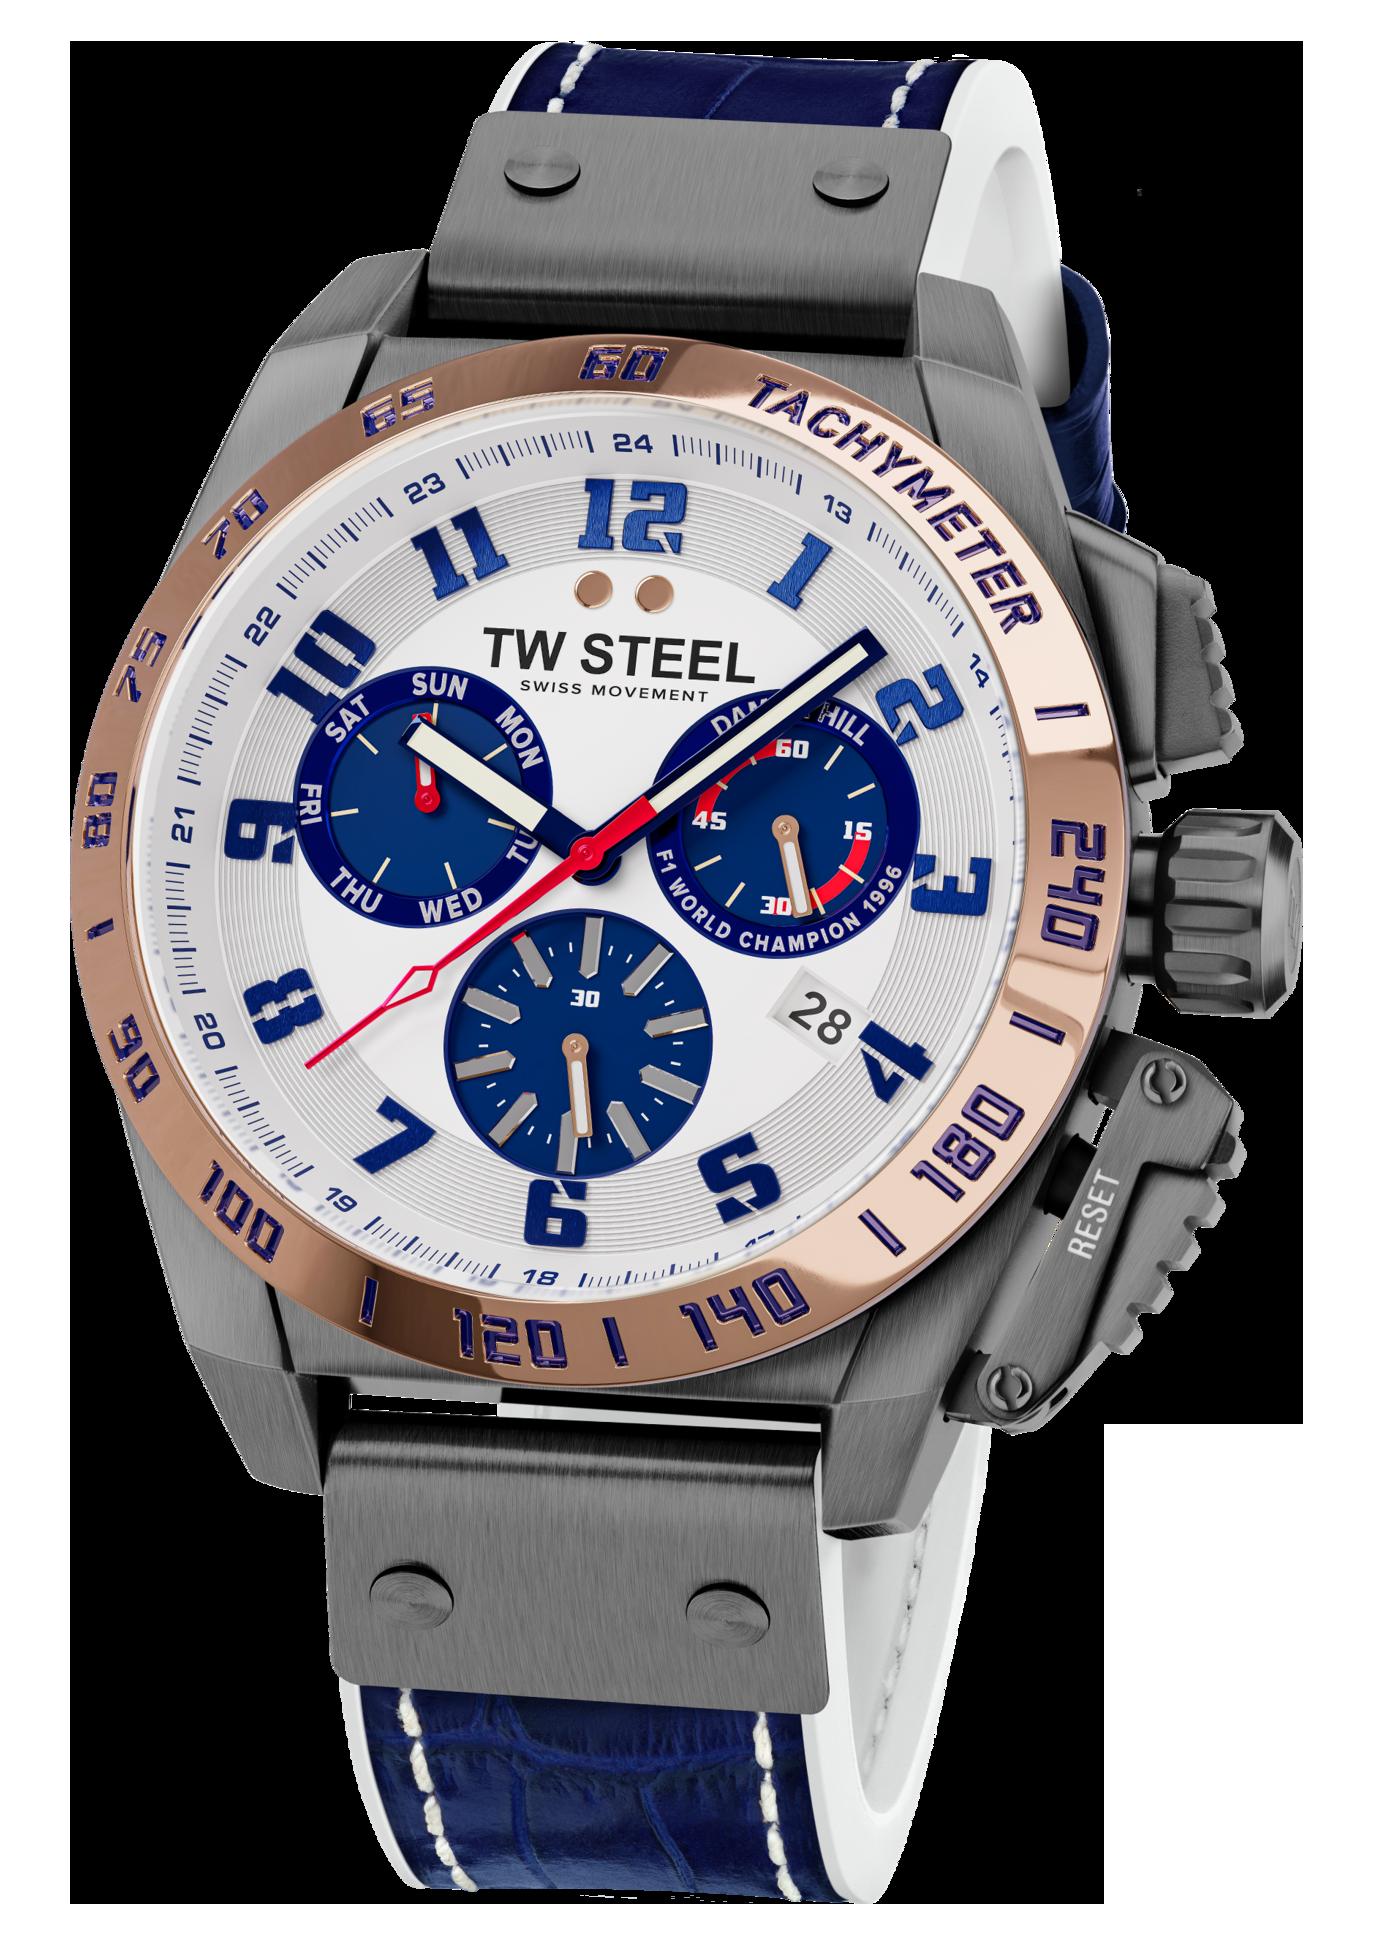 TW Steel Damon Hill Limited Edition horloge